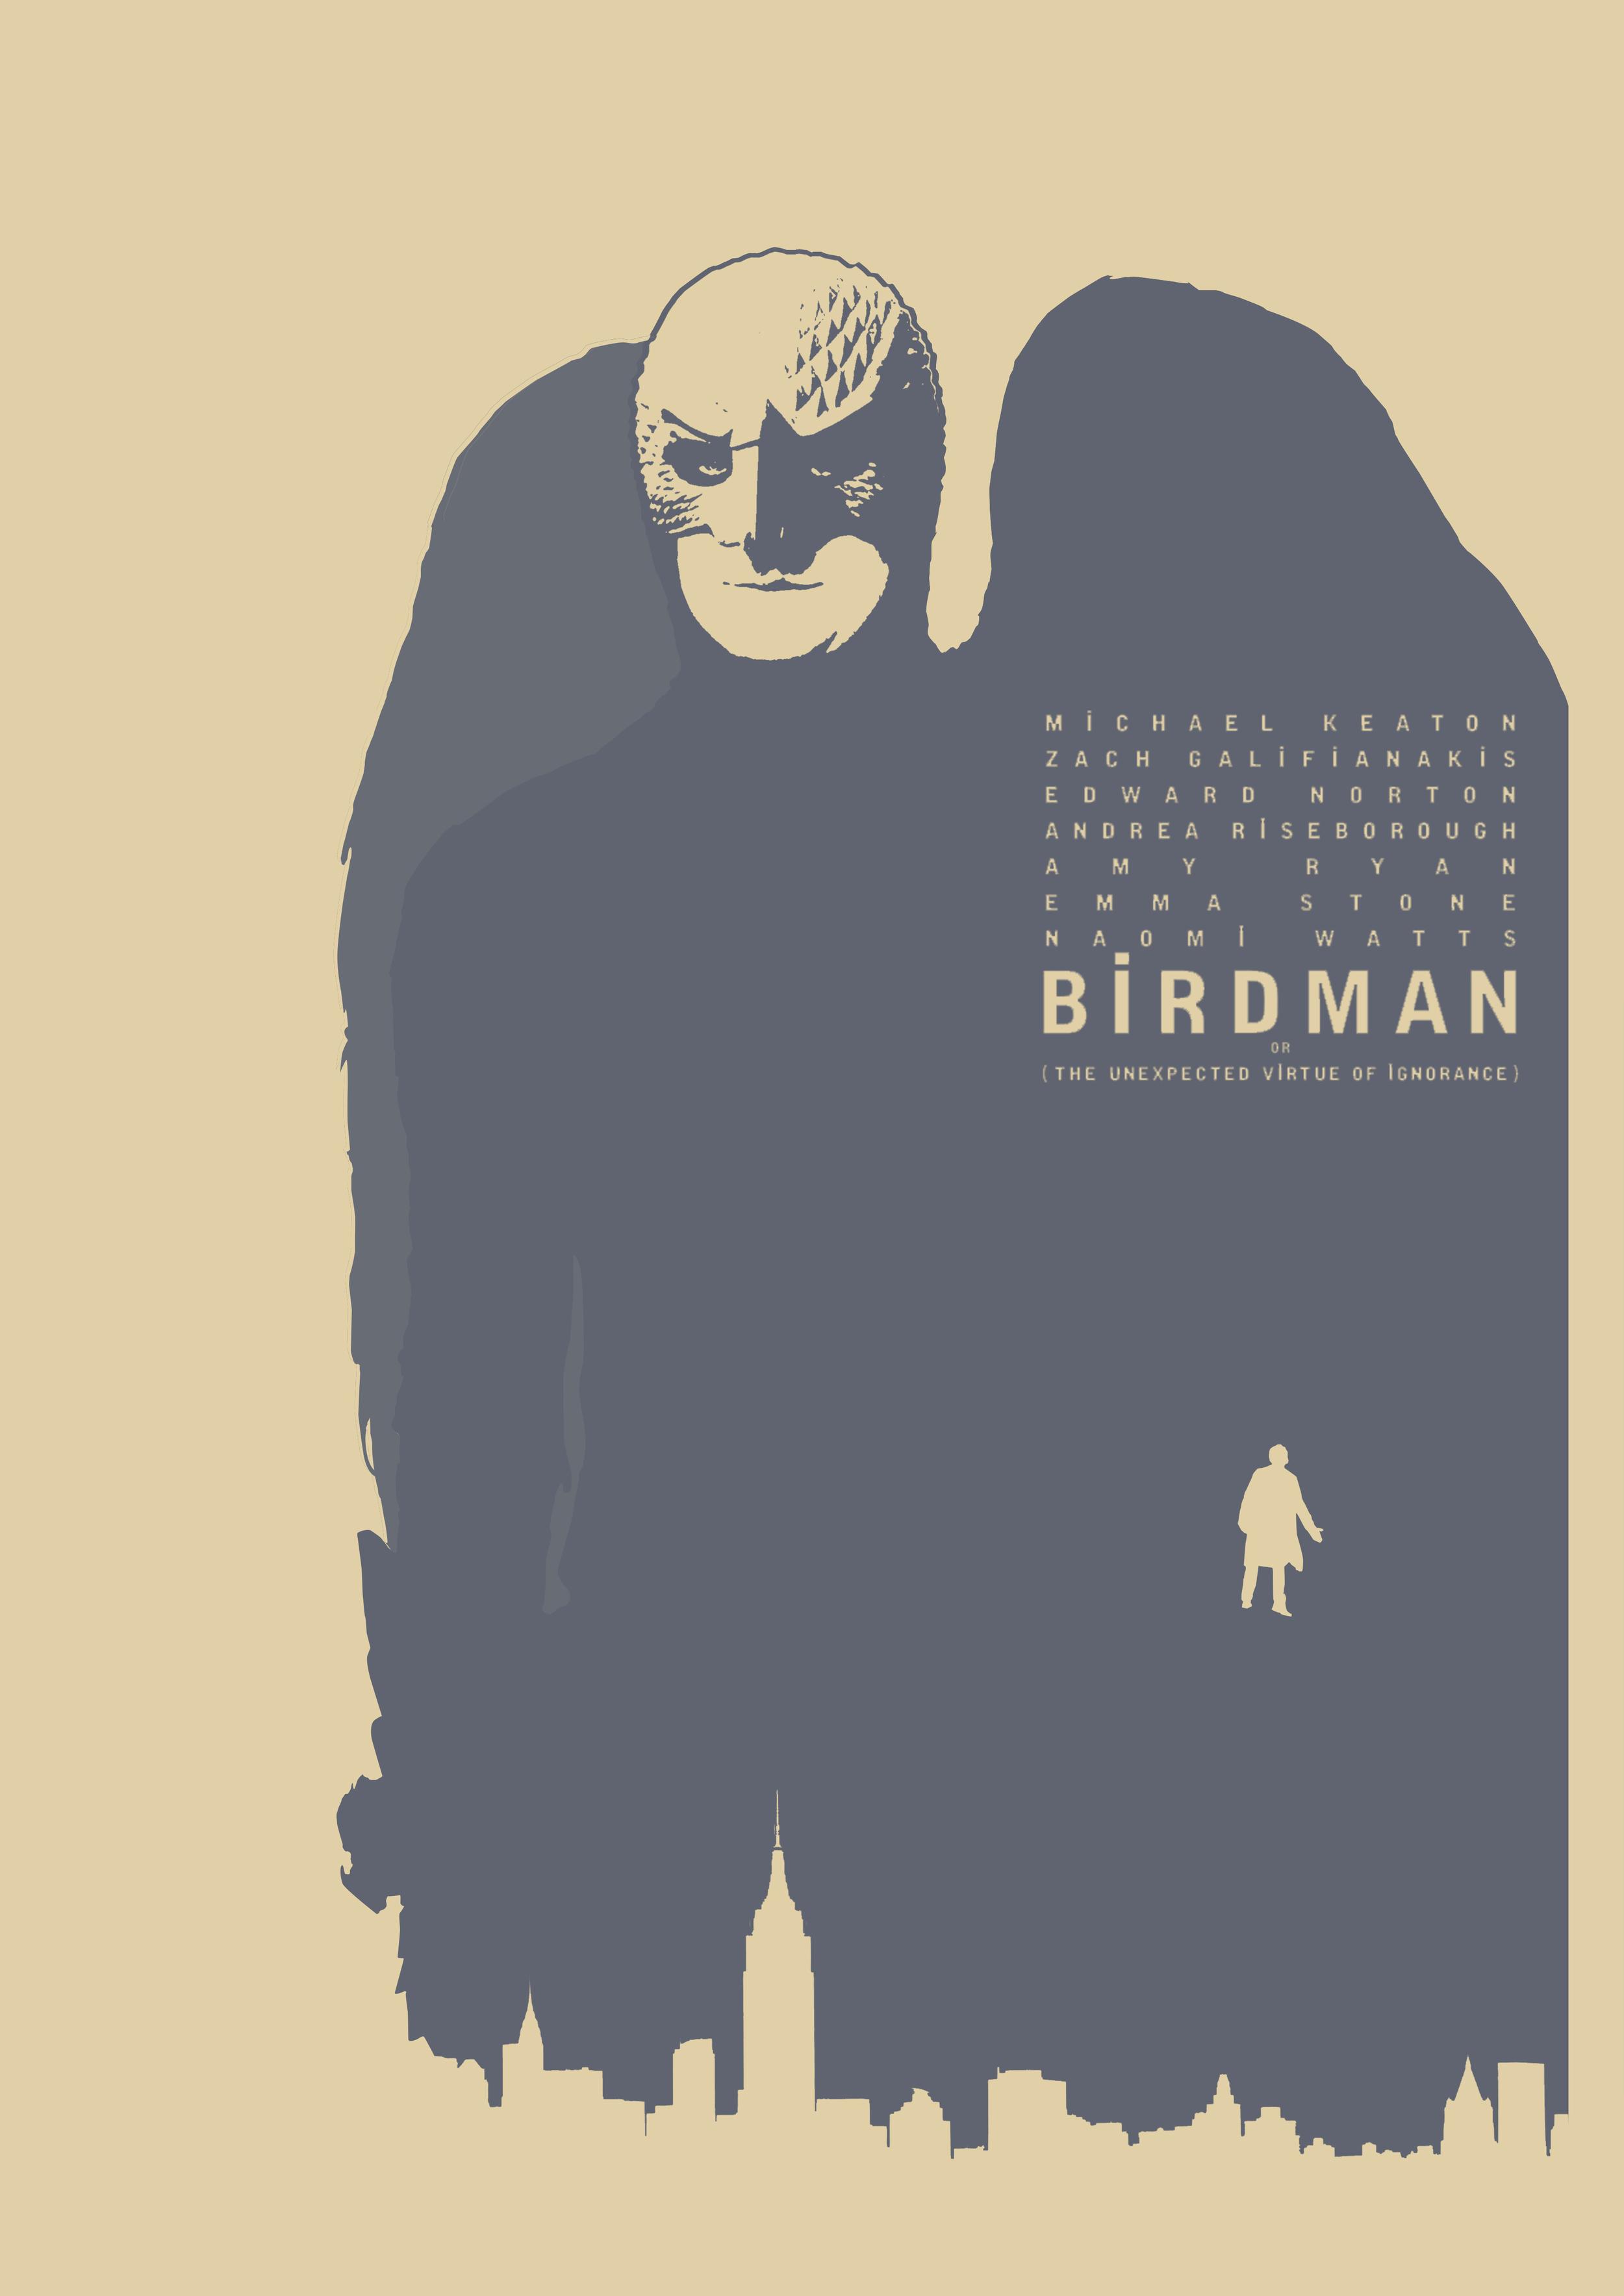 Birdman - Pôster minimalista. Por Lewis Dowsett